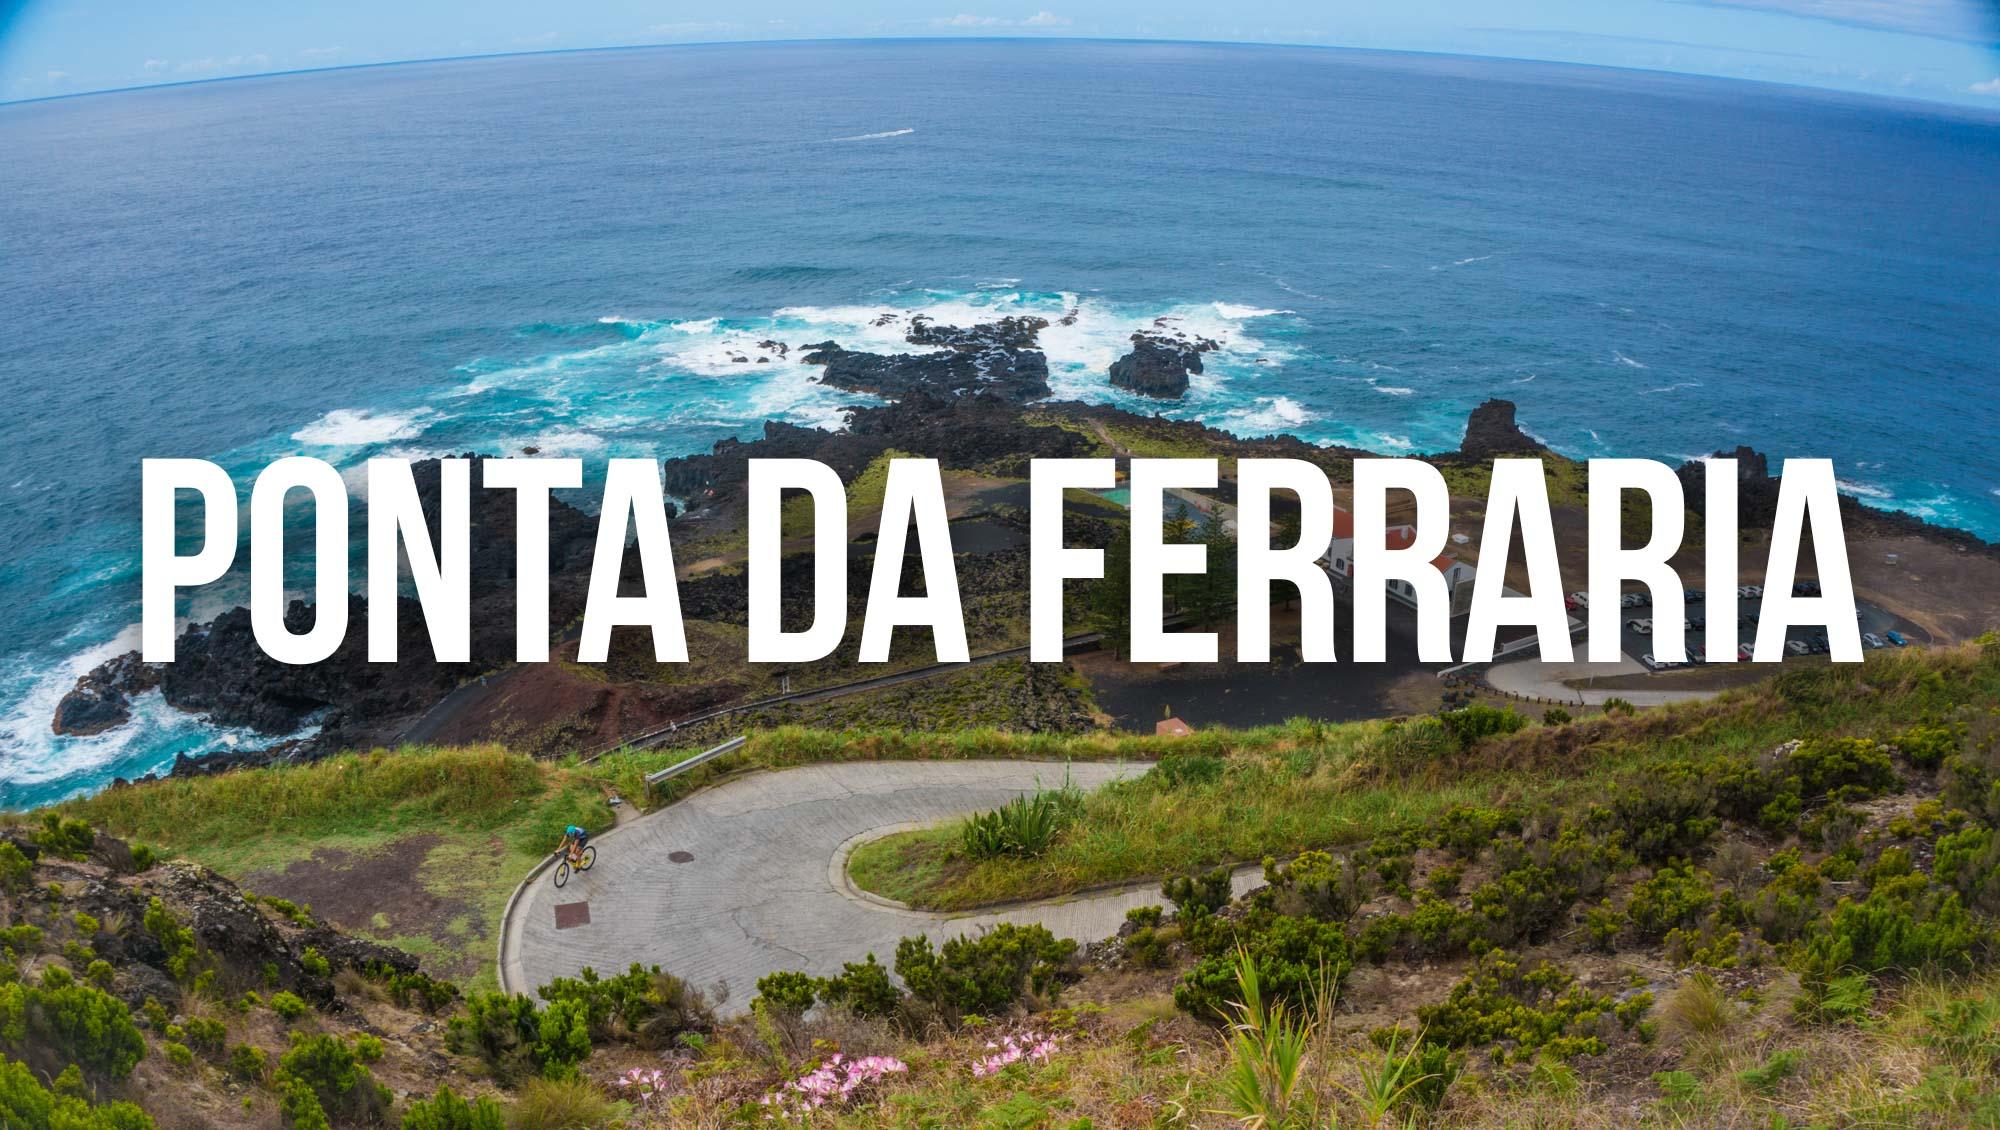 Ponta da Ferraria